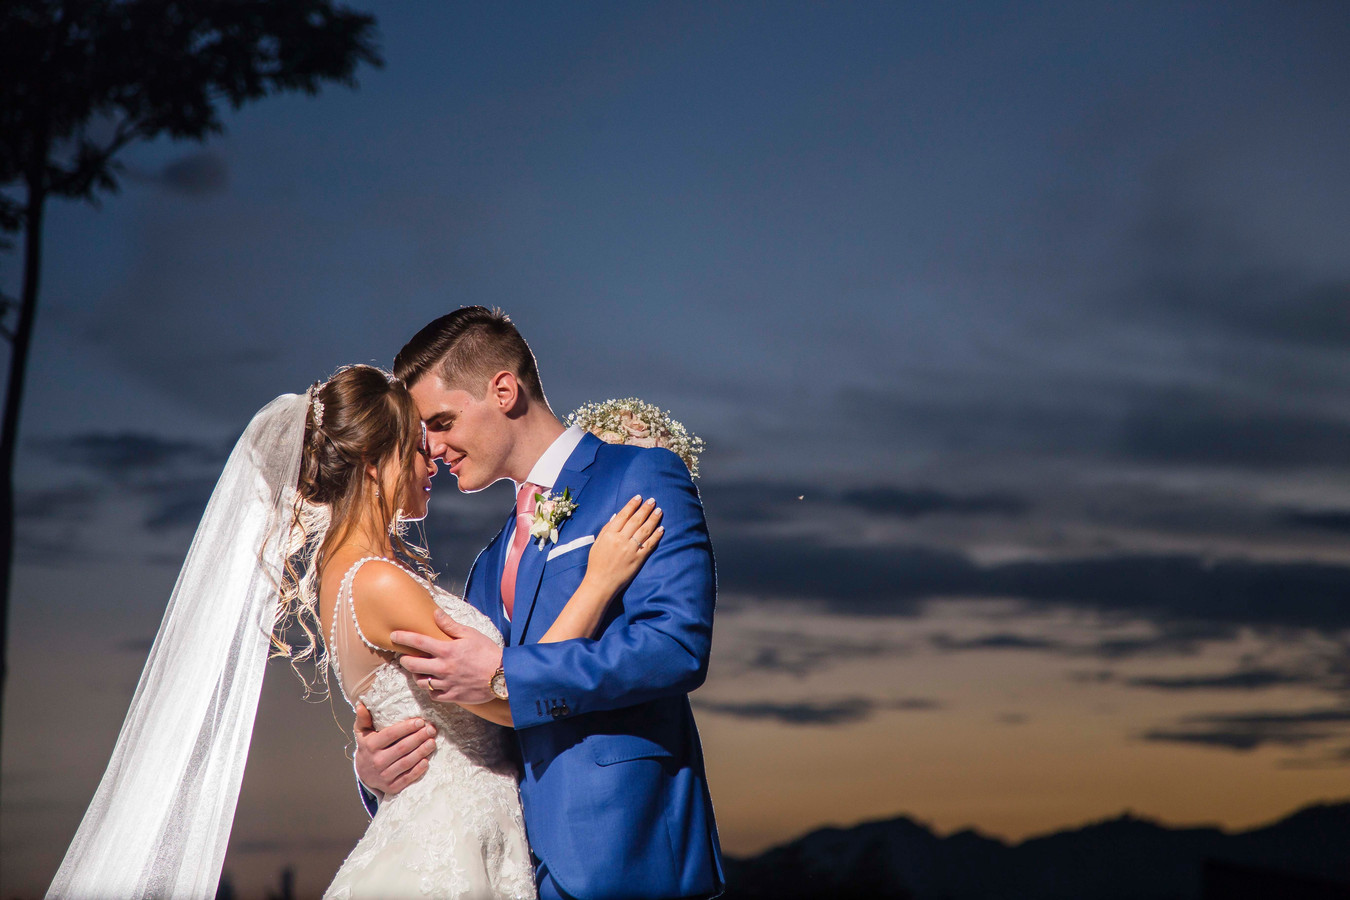 Jens en Antonella huwden op 1 juni in Colombia.